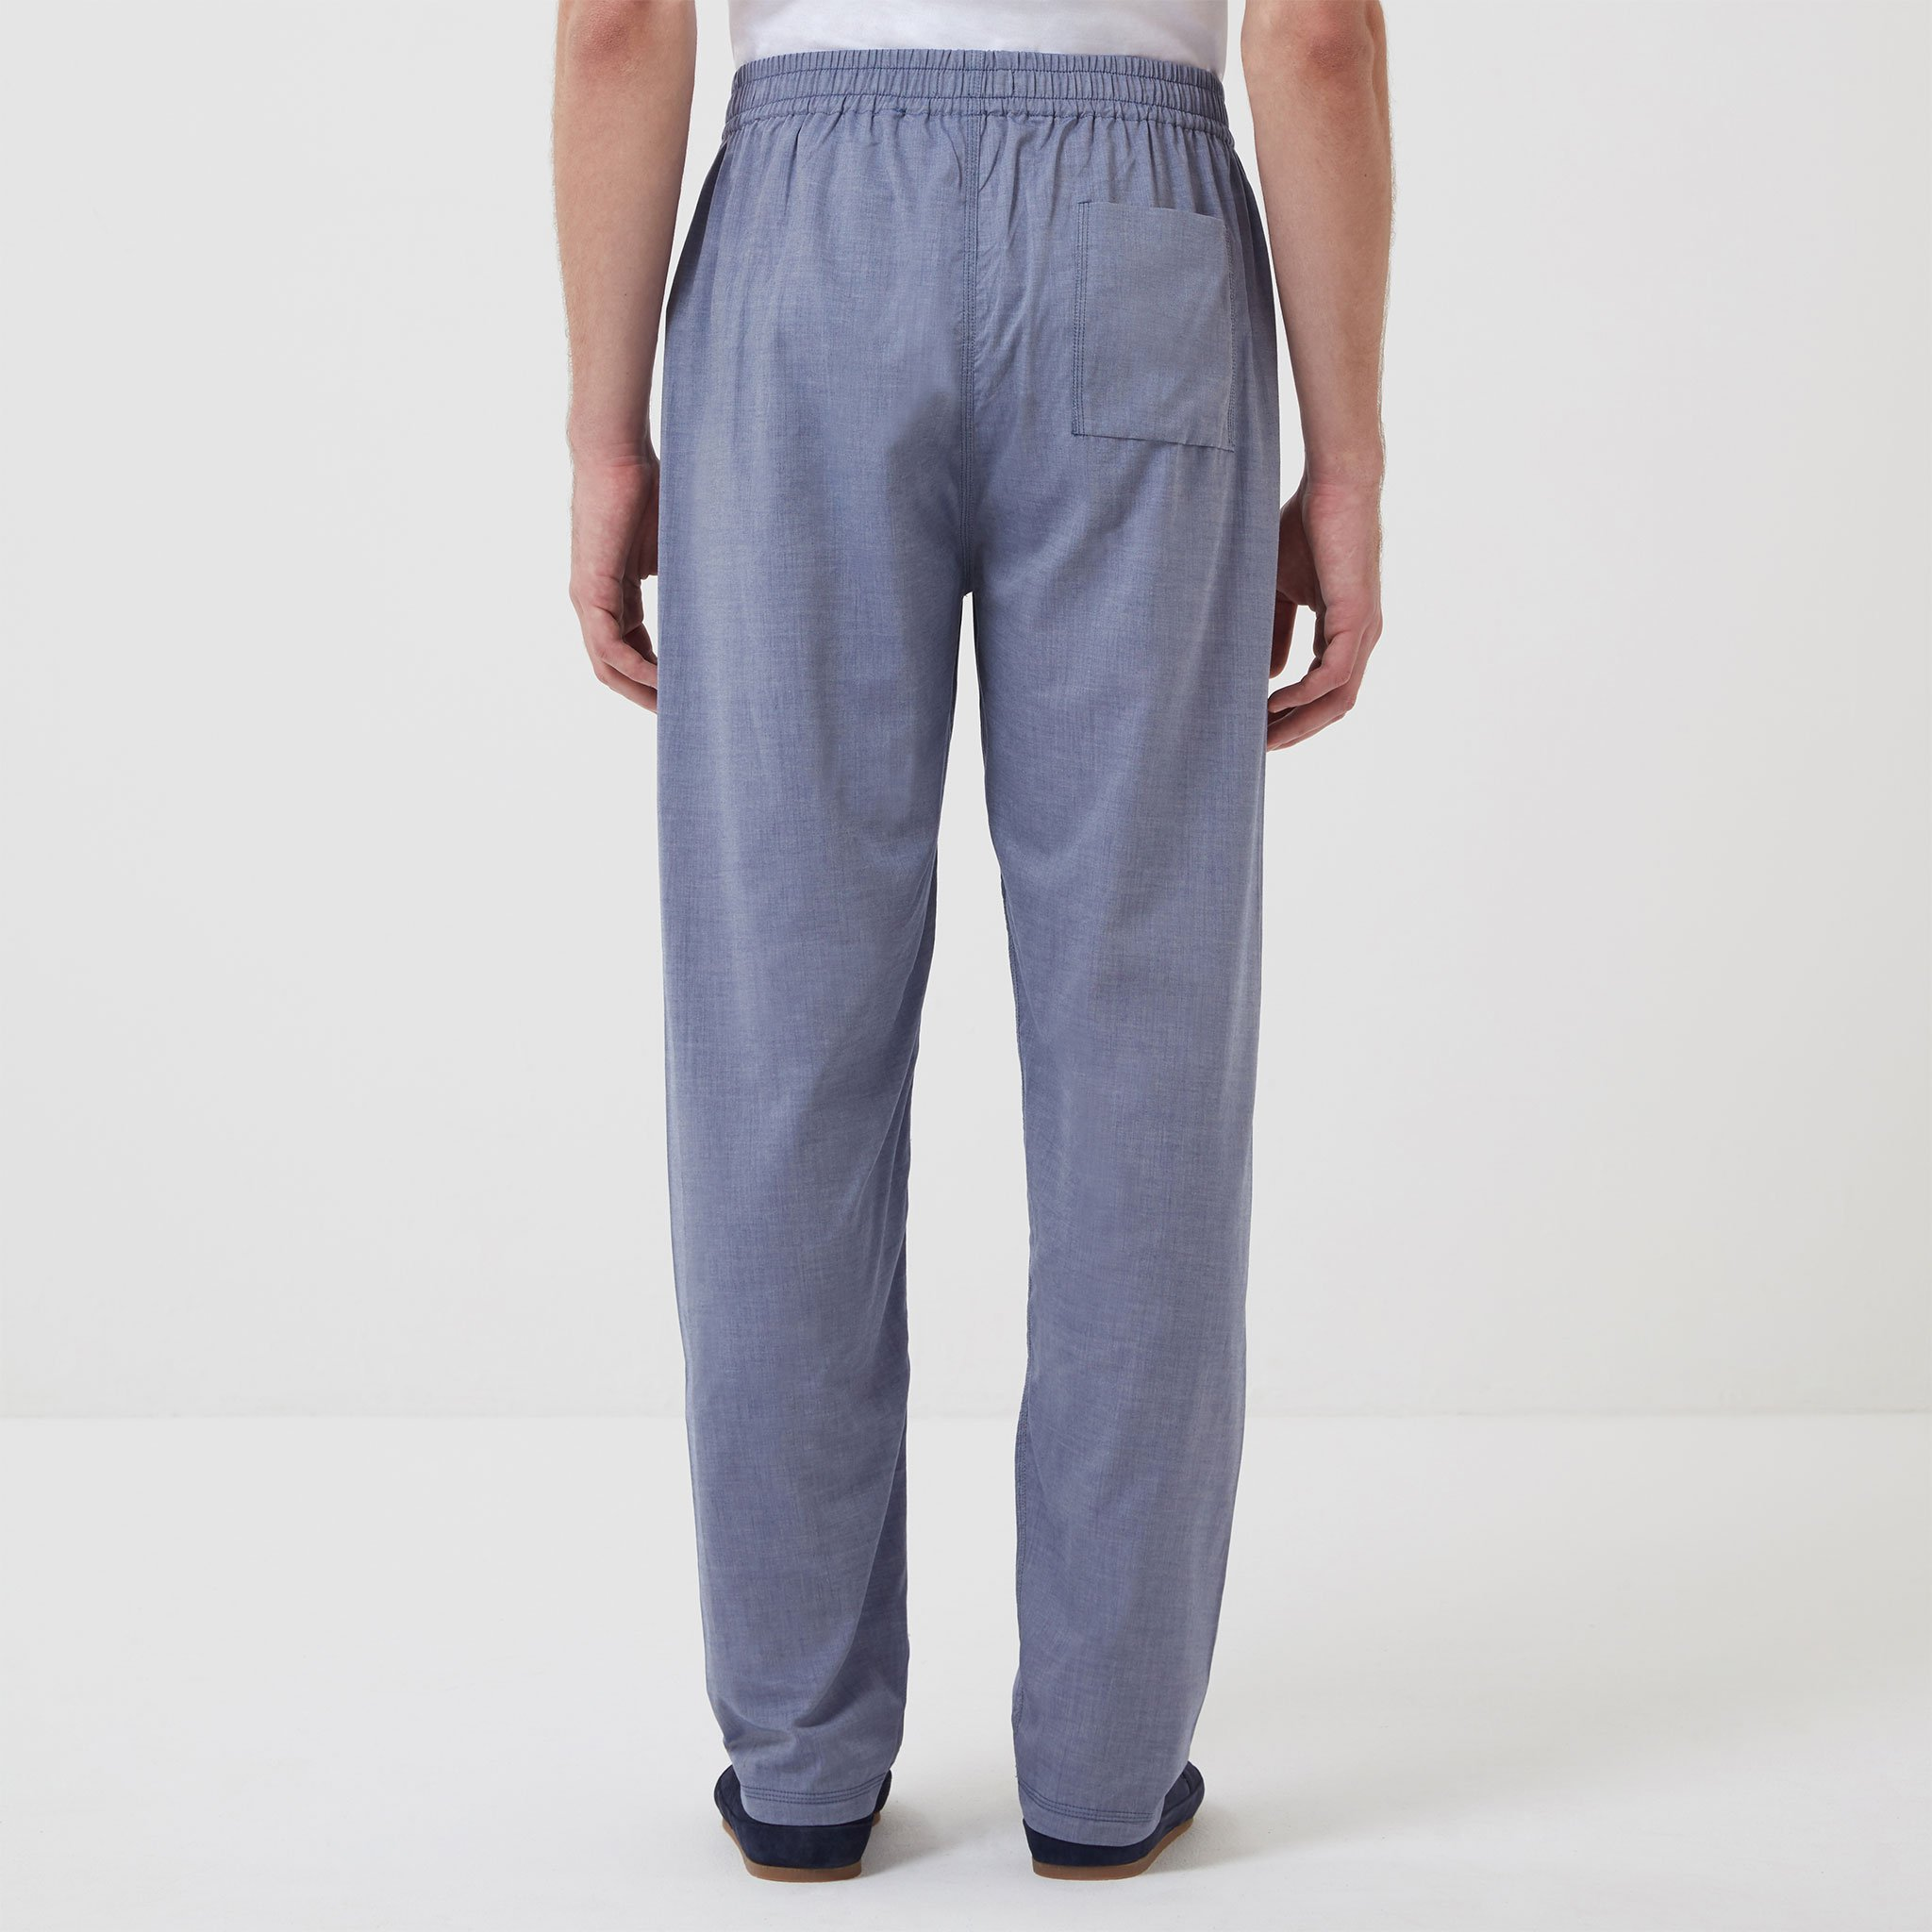 Cotton-Cashmere-Sleep-Trouser-Chambray-Model_03.jpg